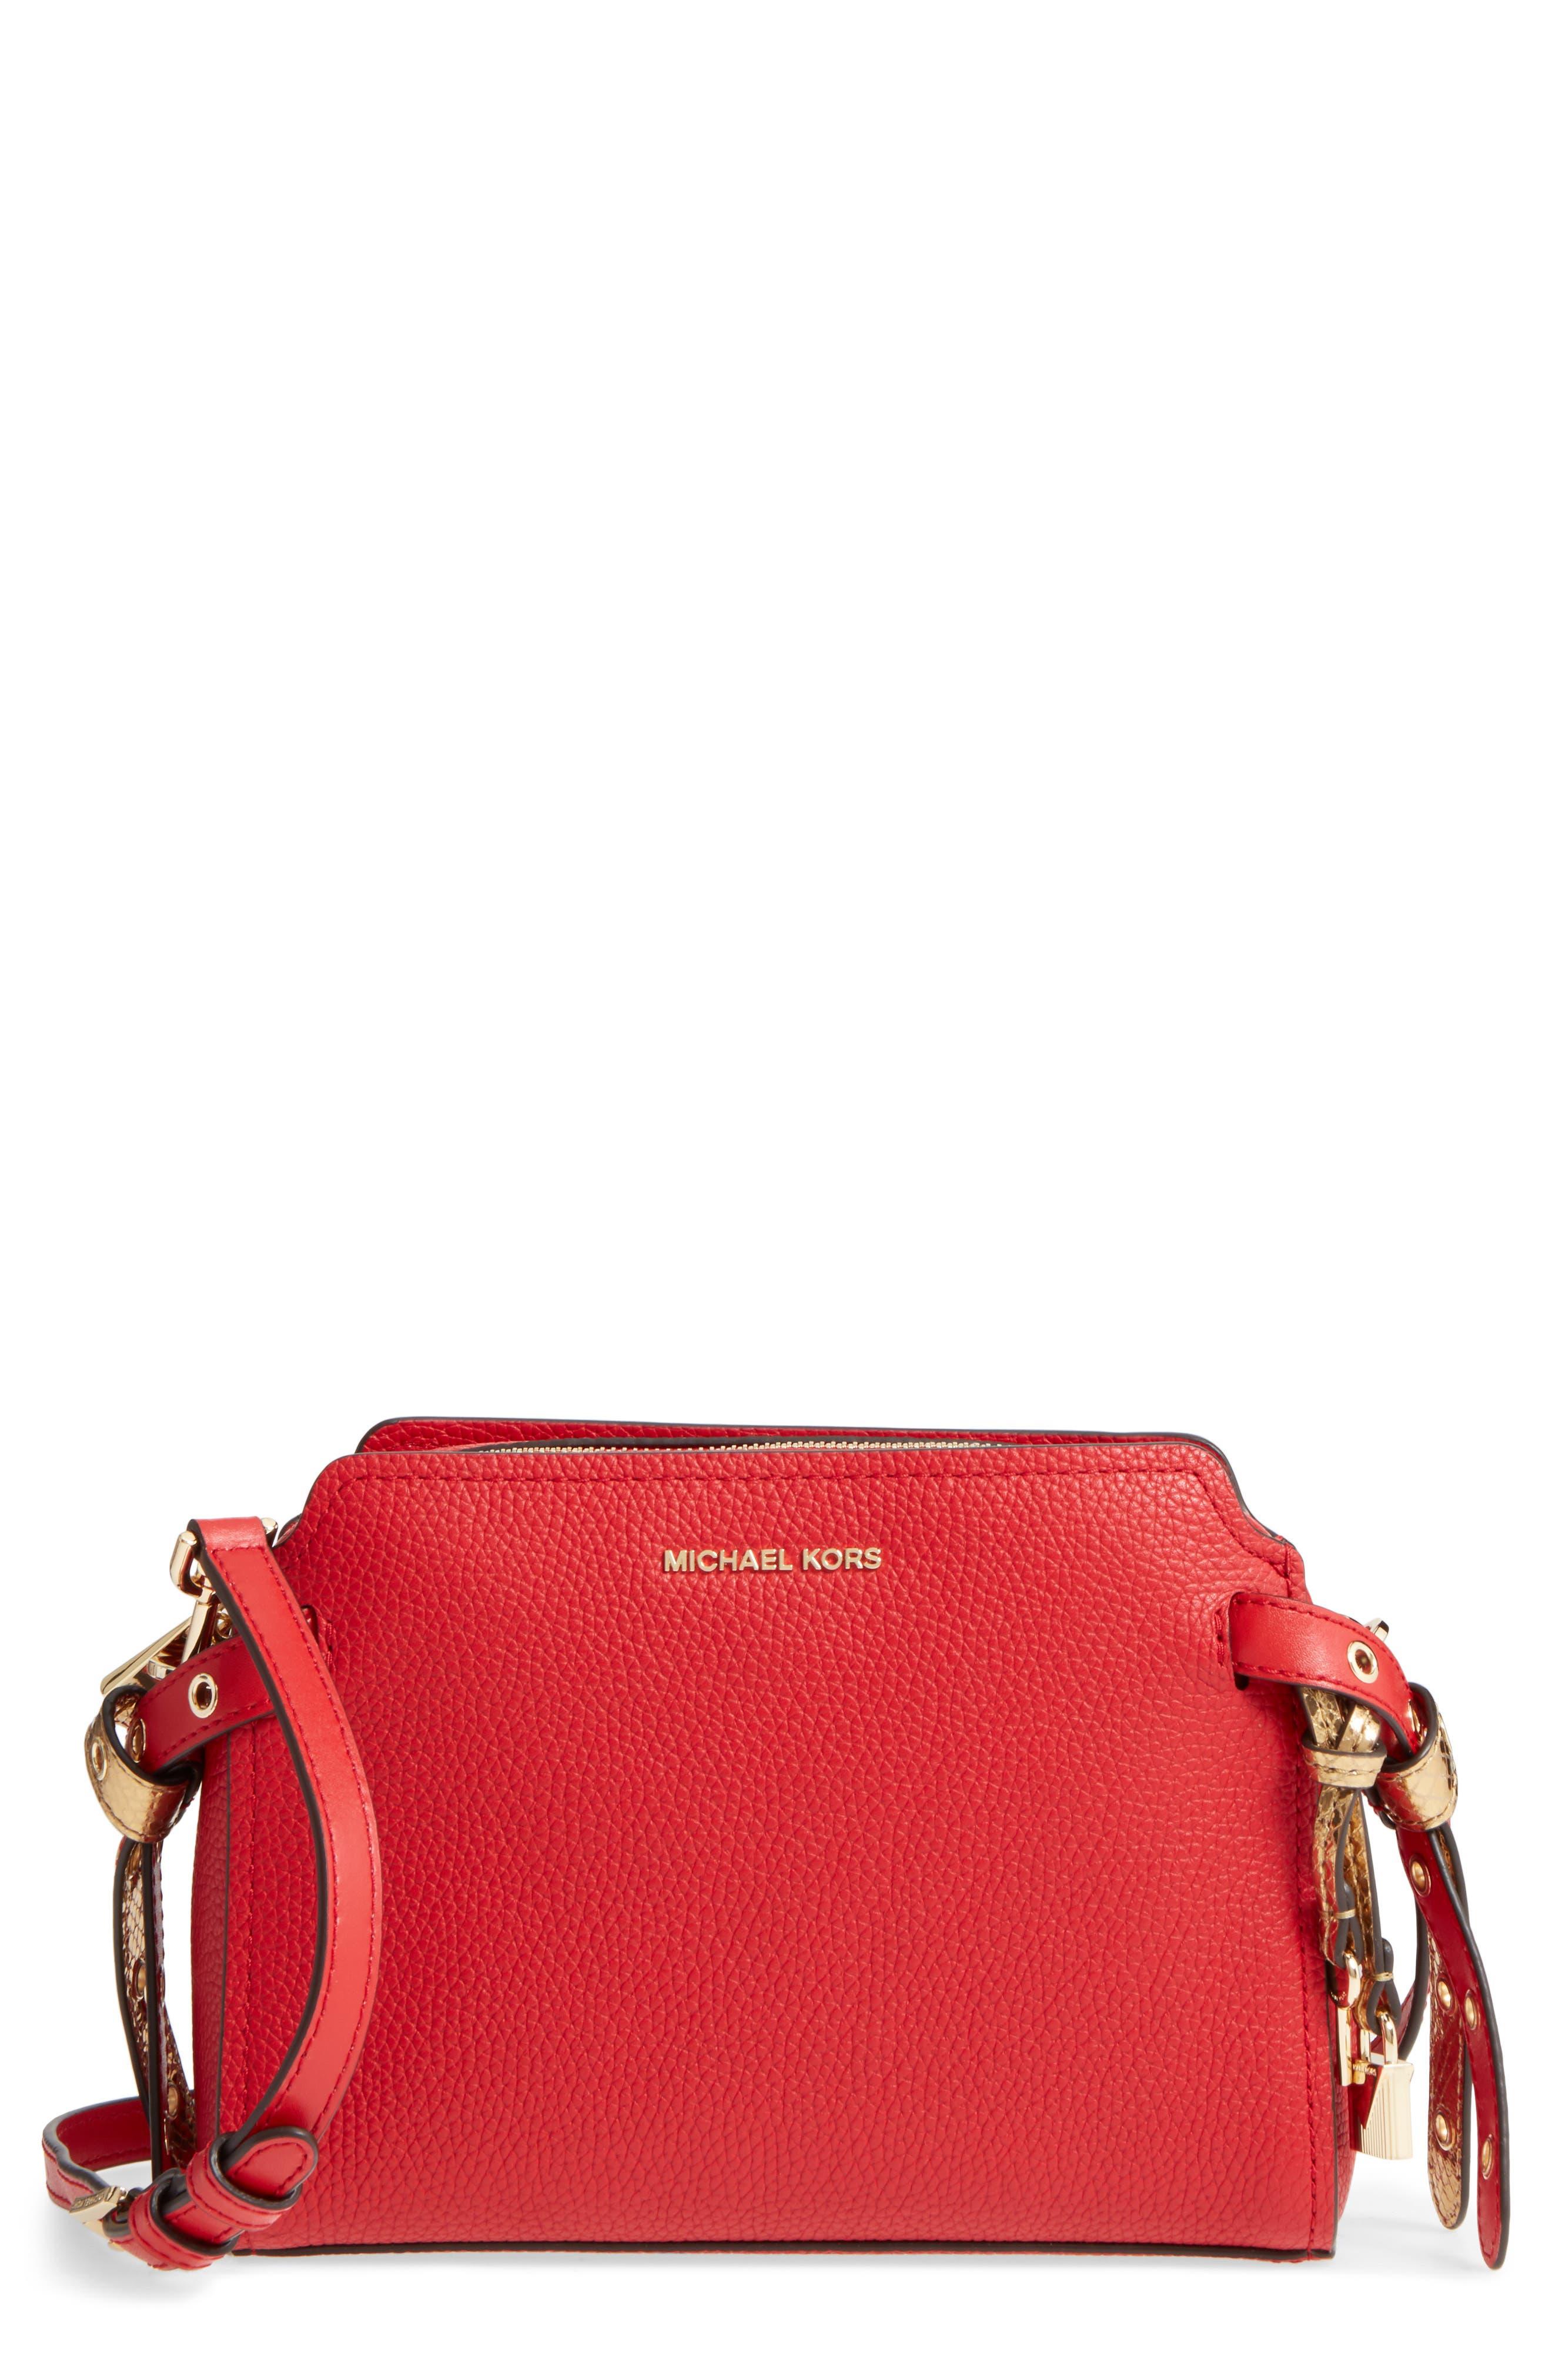 Michael Kors Medium Lenox Leather Messenger Bag